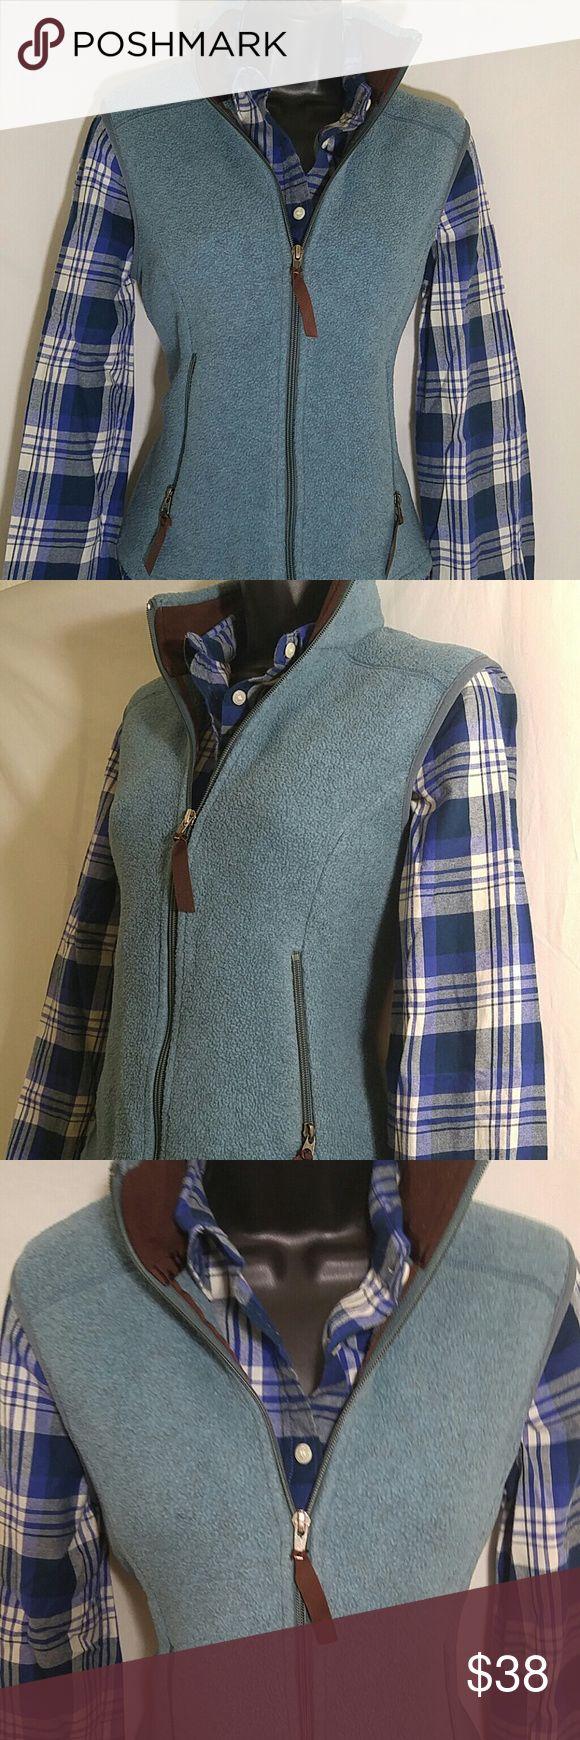 Selling this PATAGONIA SYNCHILLA Light Blue Vest Size S on Poshmark! My username is: 7thvintage. #shopmycloset #poshmark #fashion #shopping #style #forsale #Patagonia #Jackets & Blazers